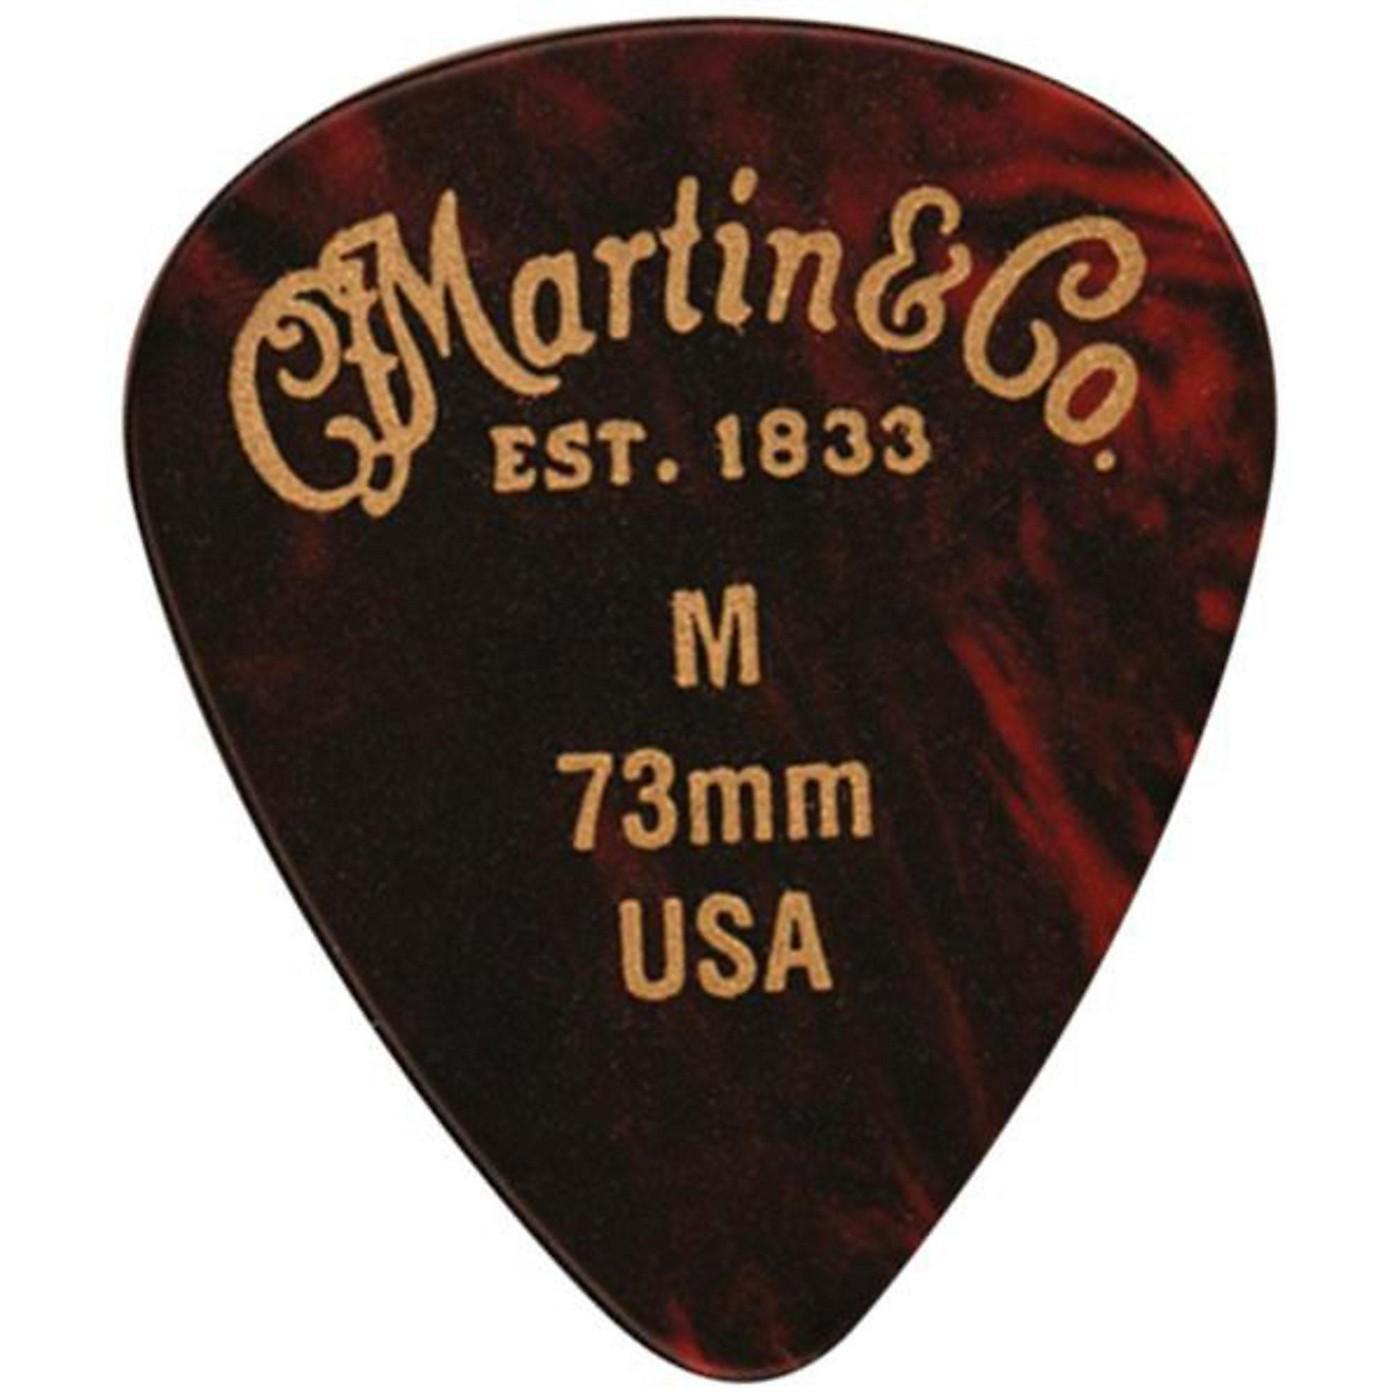 Martin #1 Guitar Pick Pack thumbnail